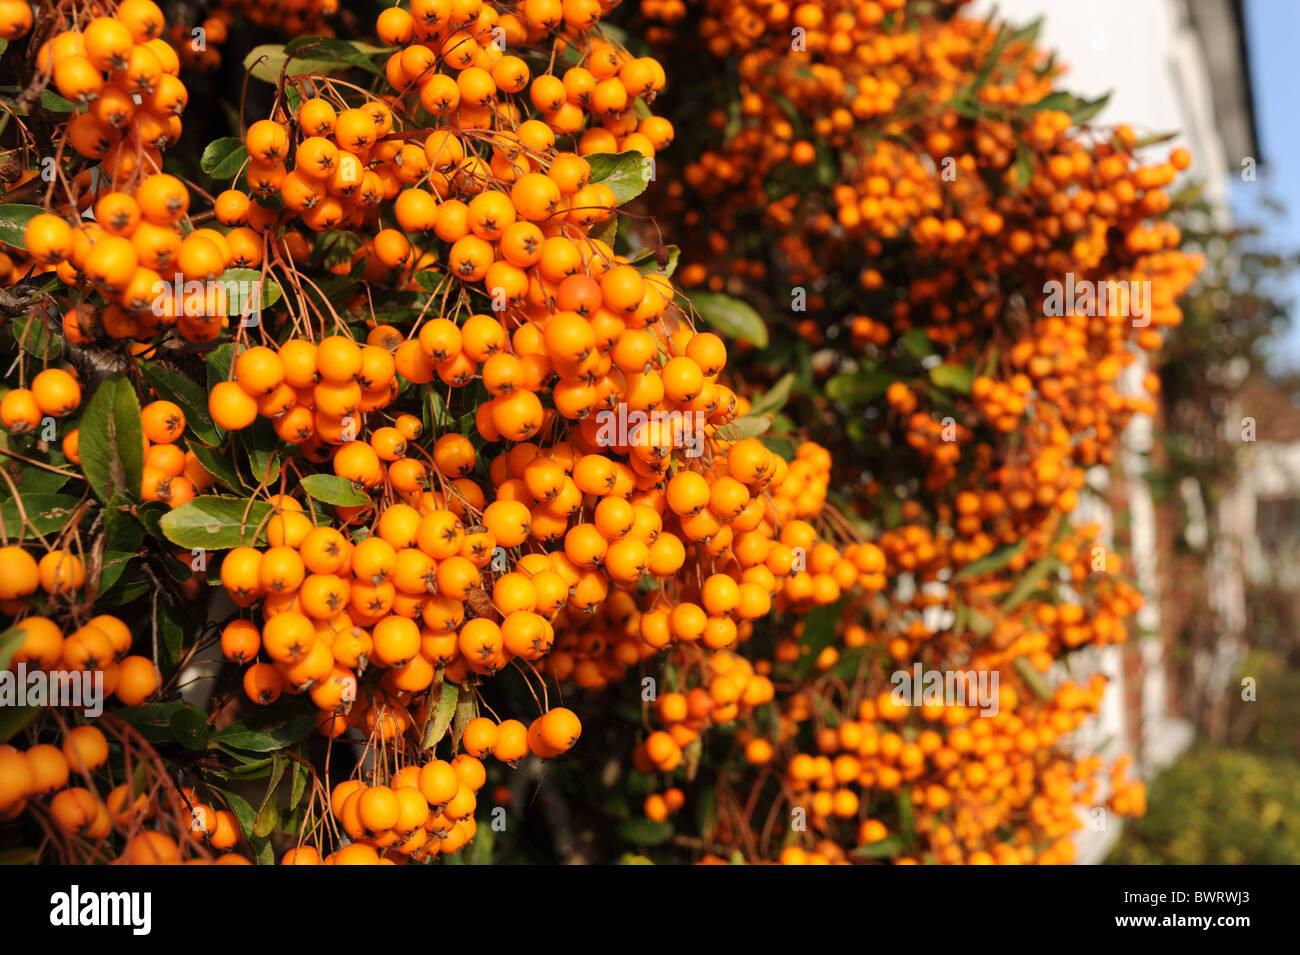 Bright Orange Berries Of The Pyracantha Bush During November